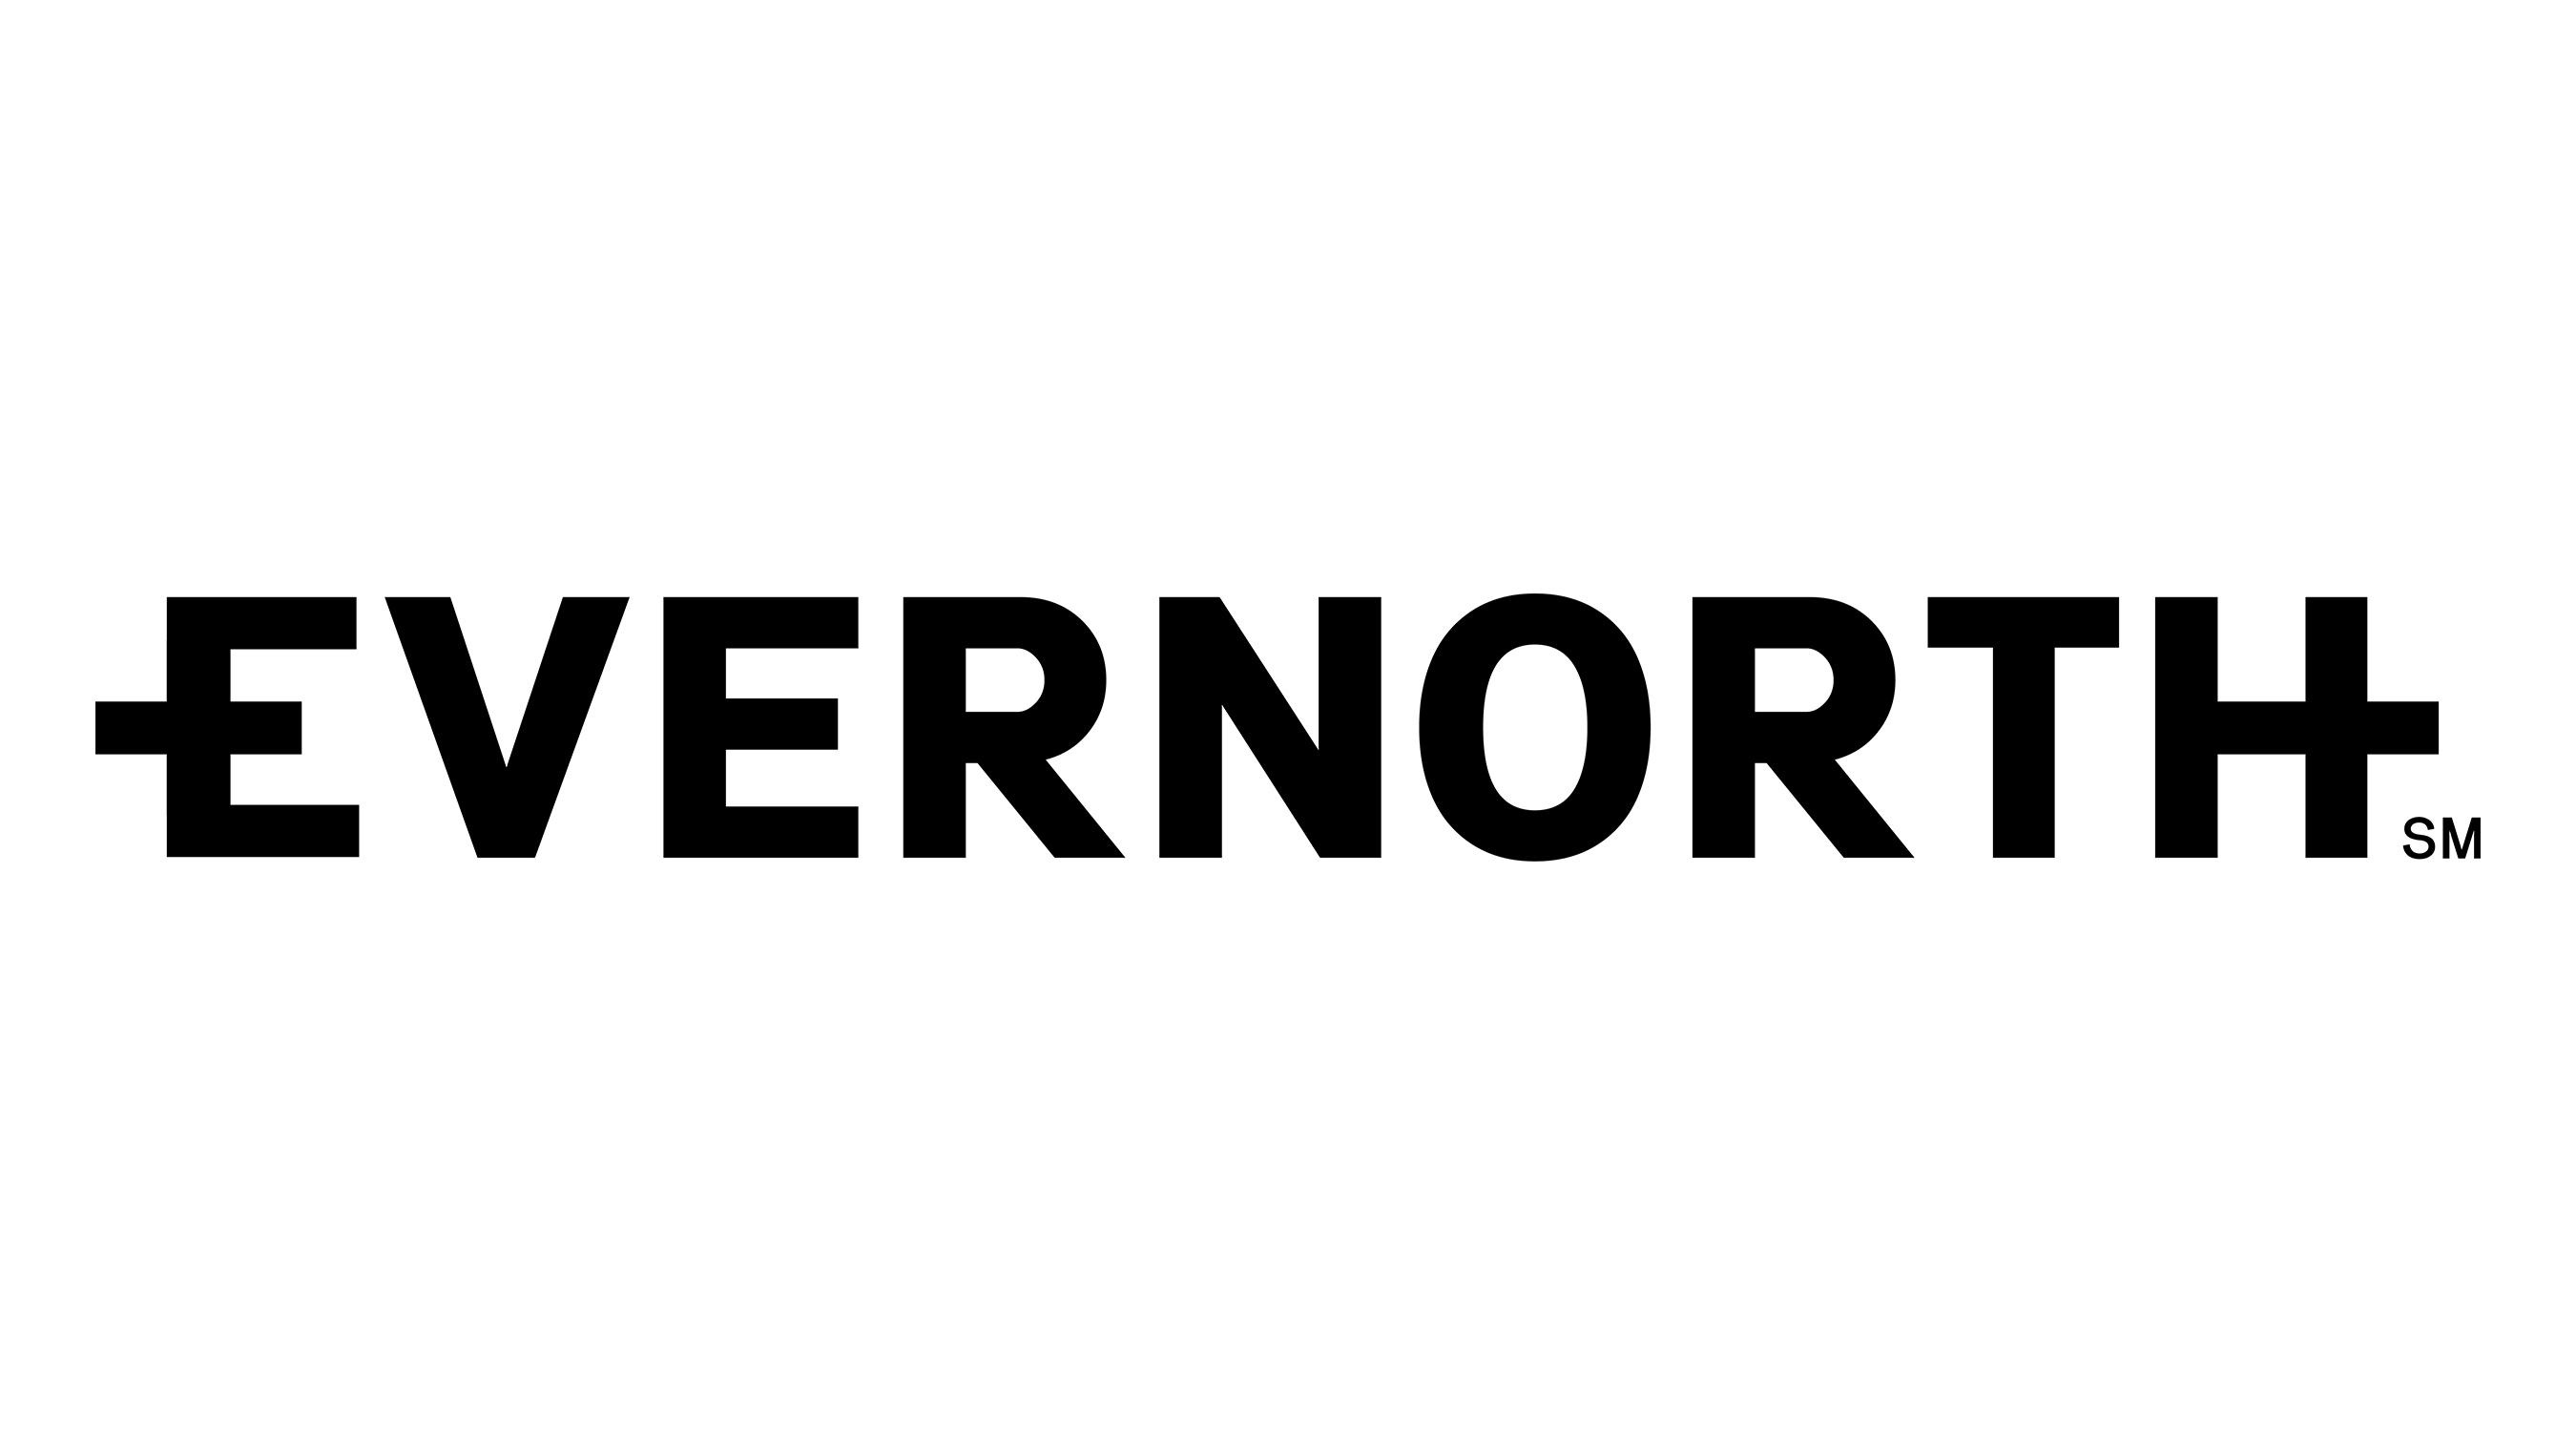 Evernorth logo